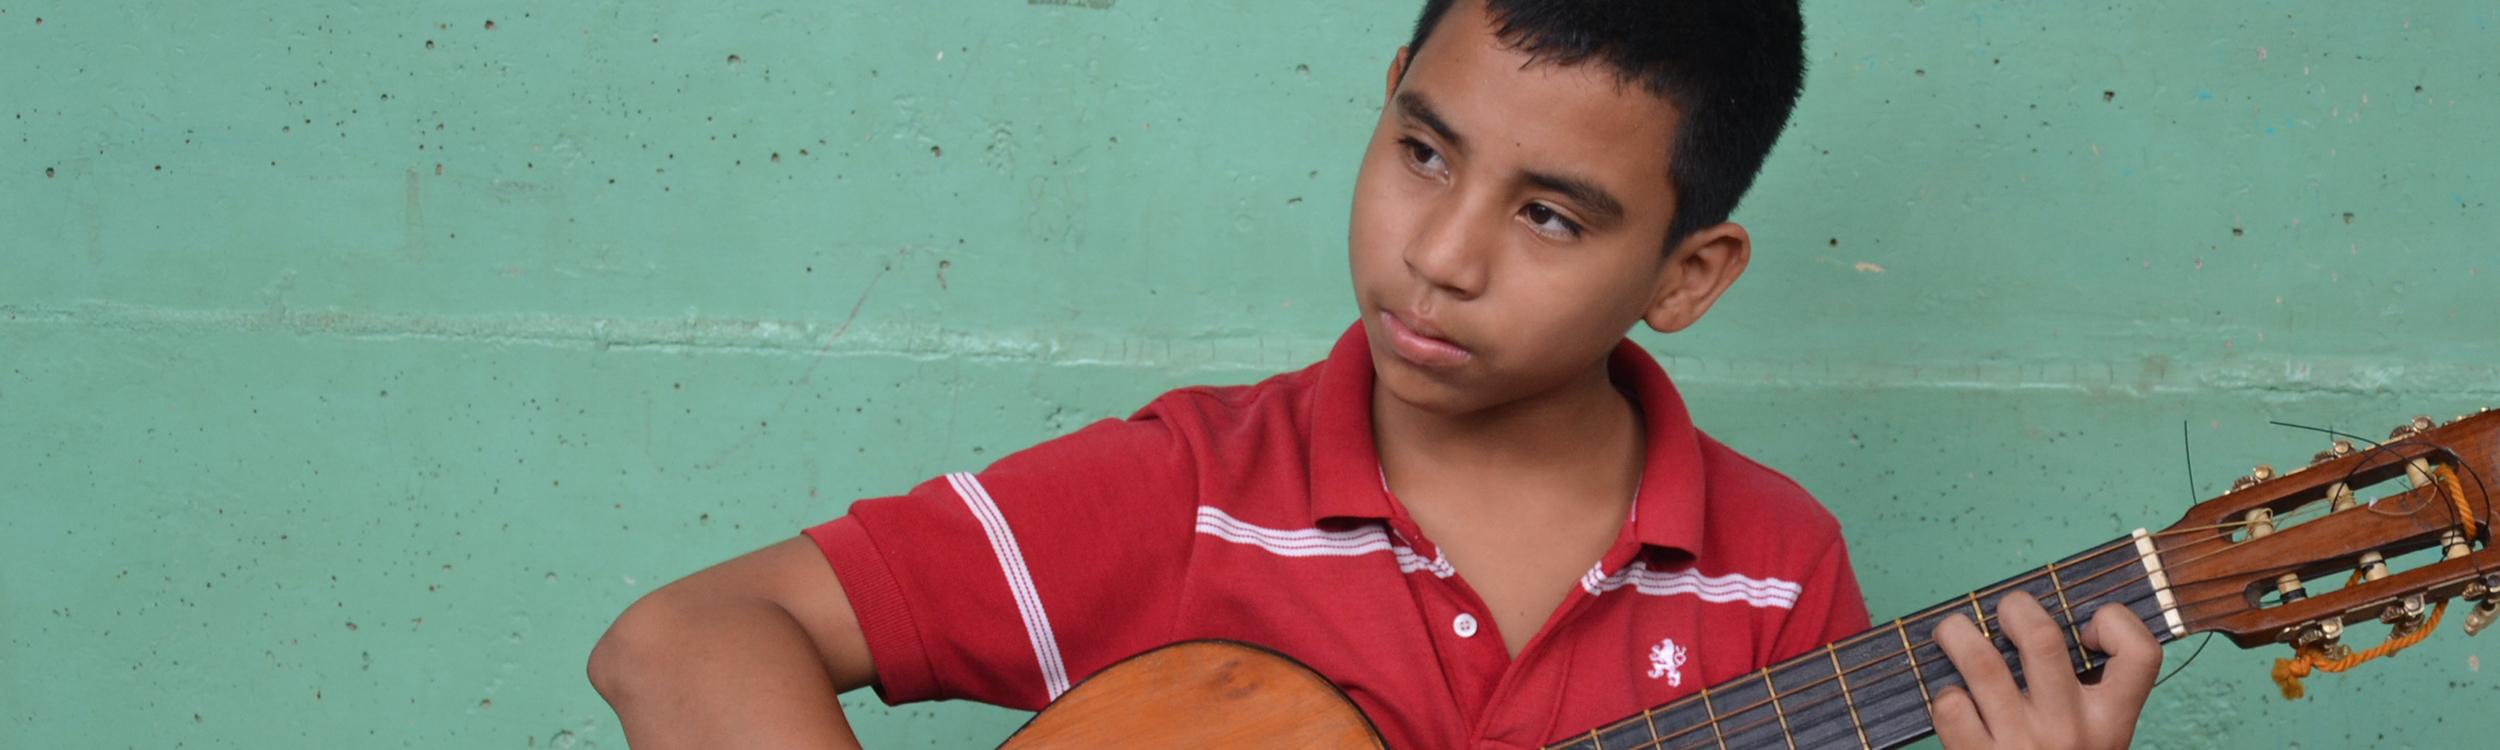 Guitarrista El Recreo